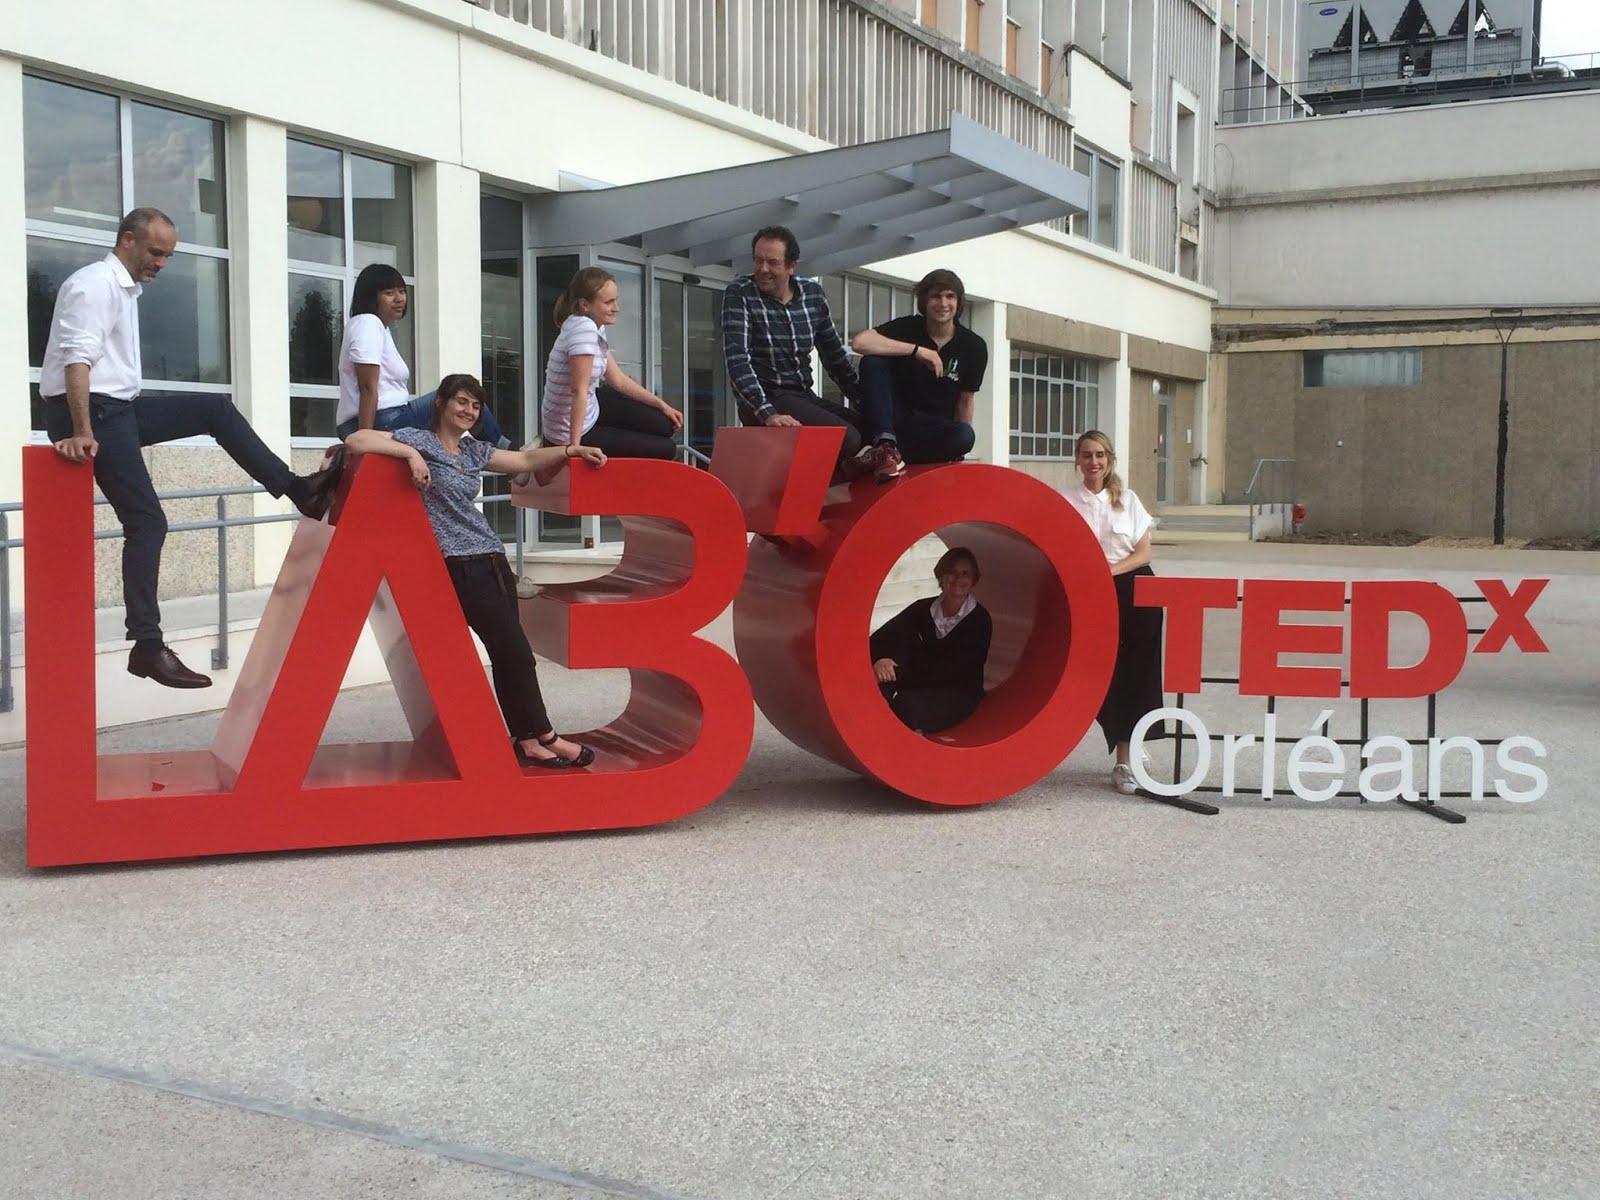 TEDx Orléans